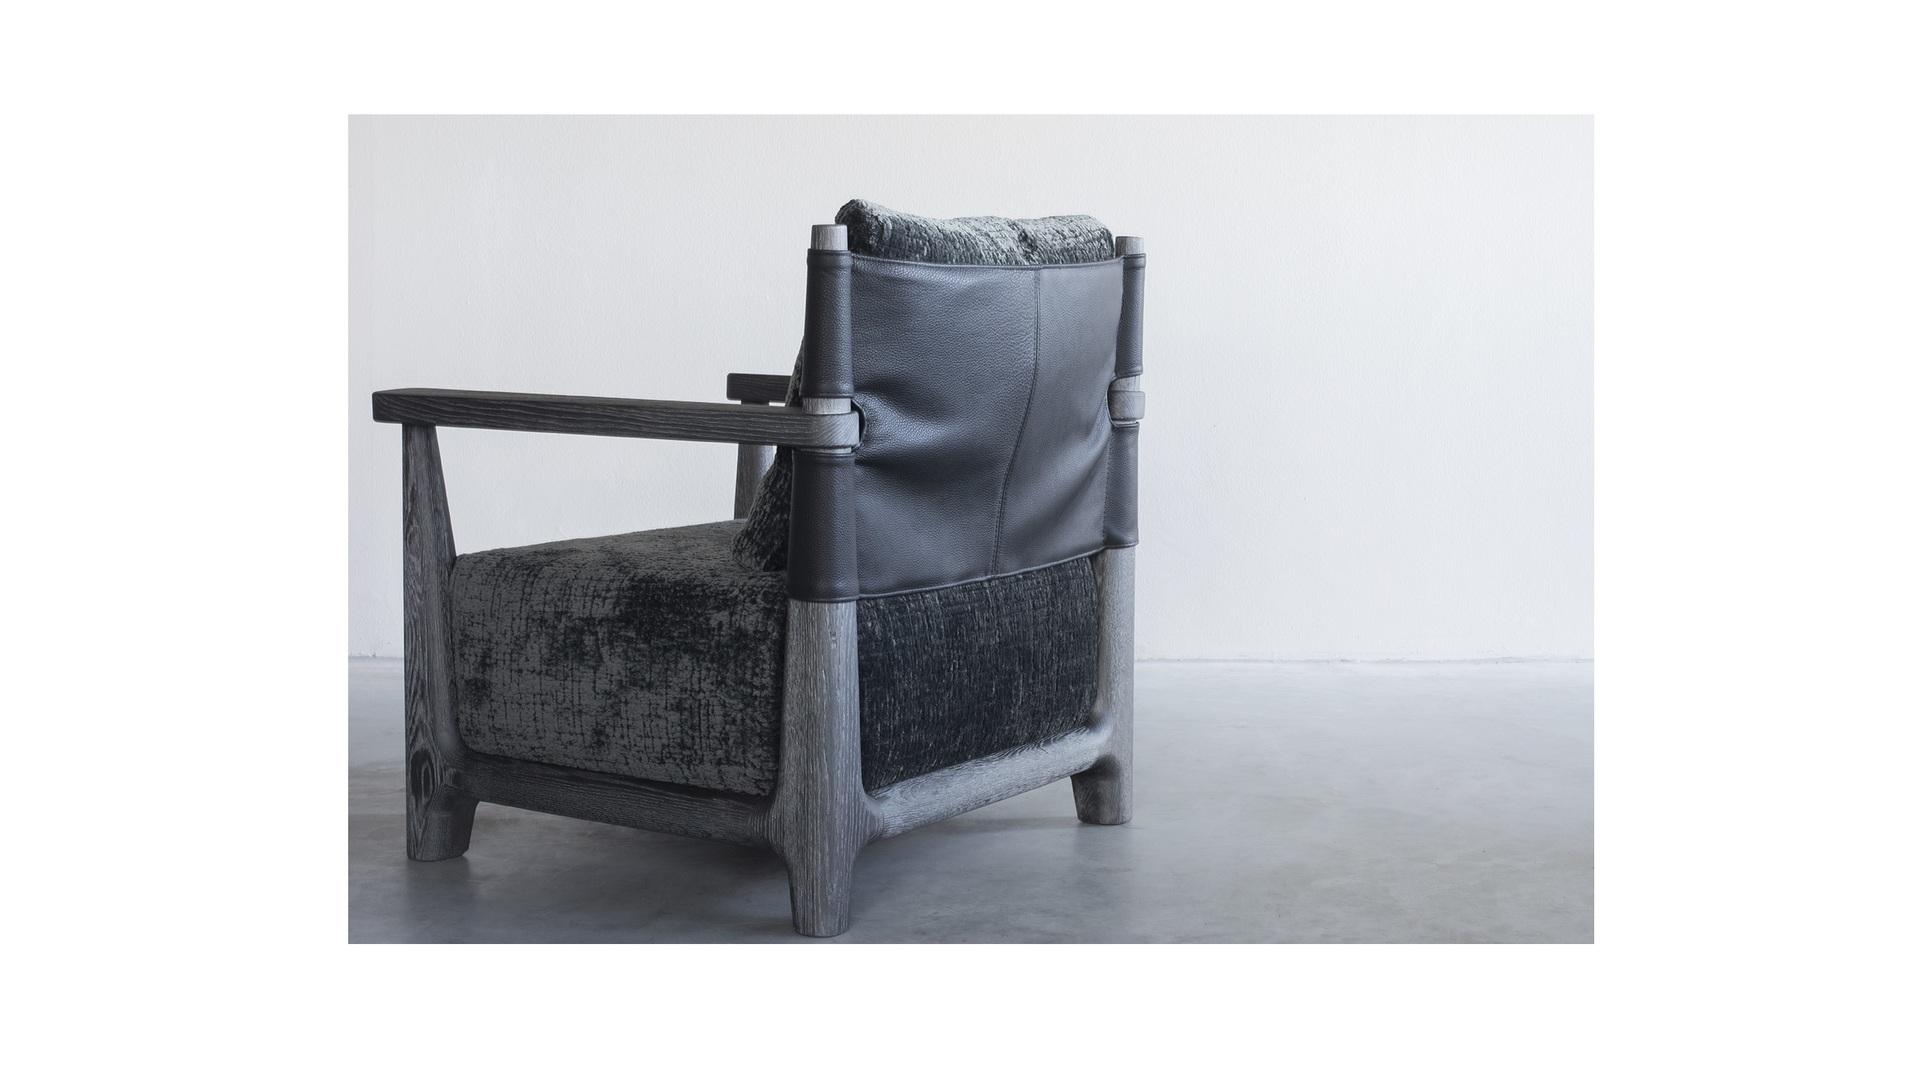 Abi fauteuil (2) klein.jpg